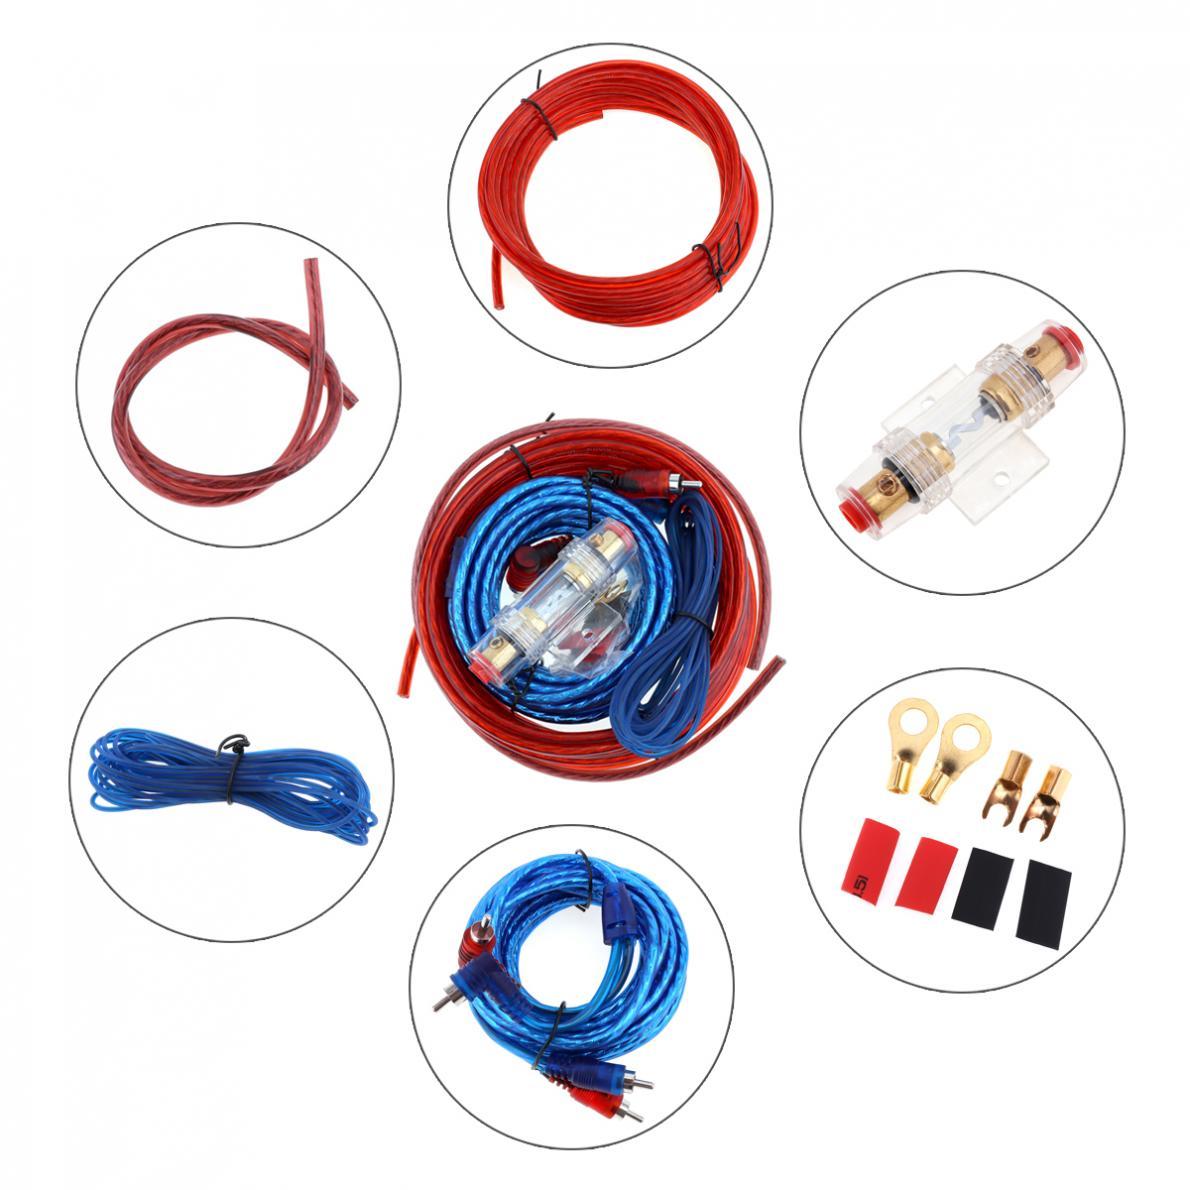 car auto audio power amplifier car subwoofer speaker installation wiring kits cables car audio line power [ 1190 x 1190 Pixel ]